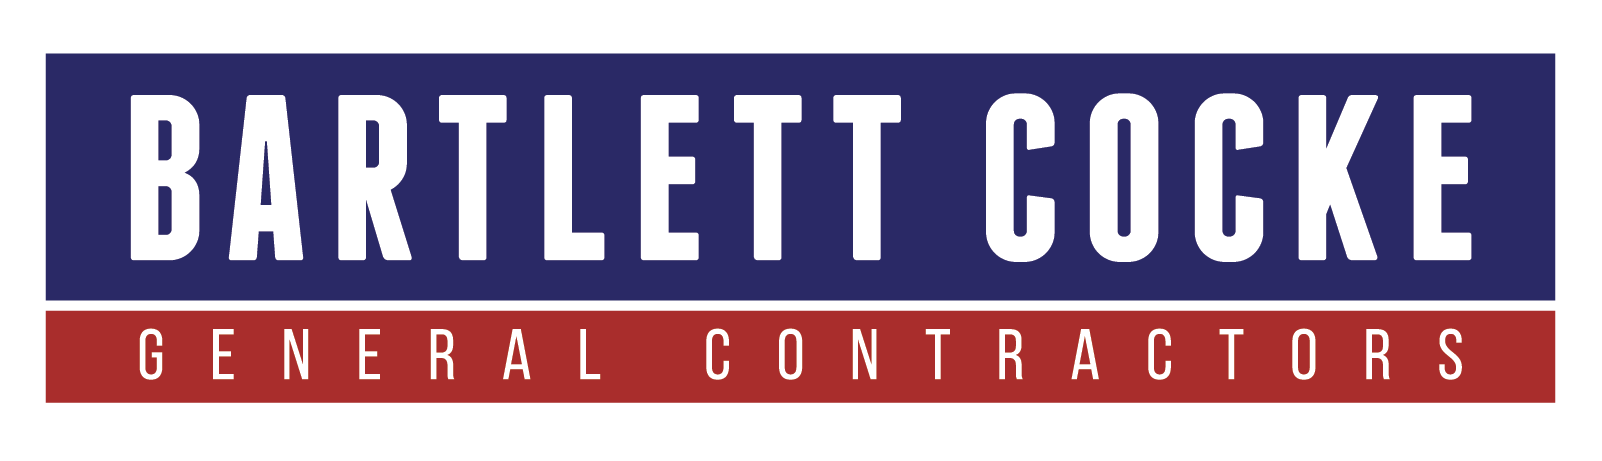 Bartlett Cocke General Contractors logo